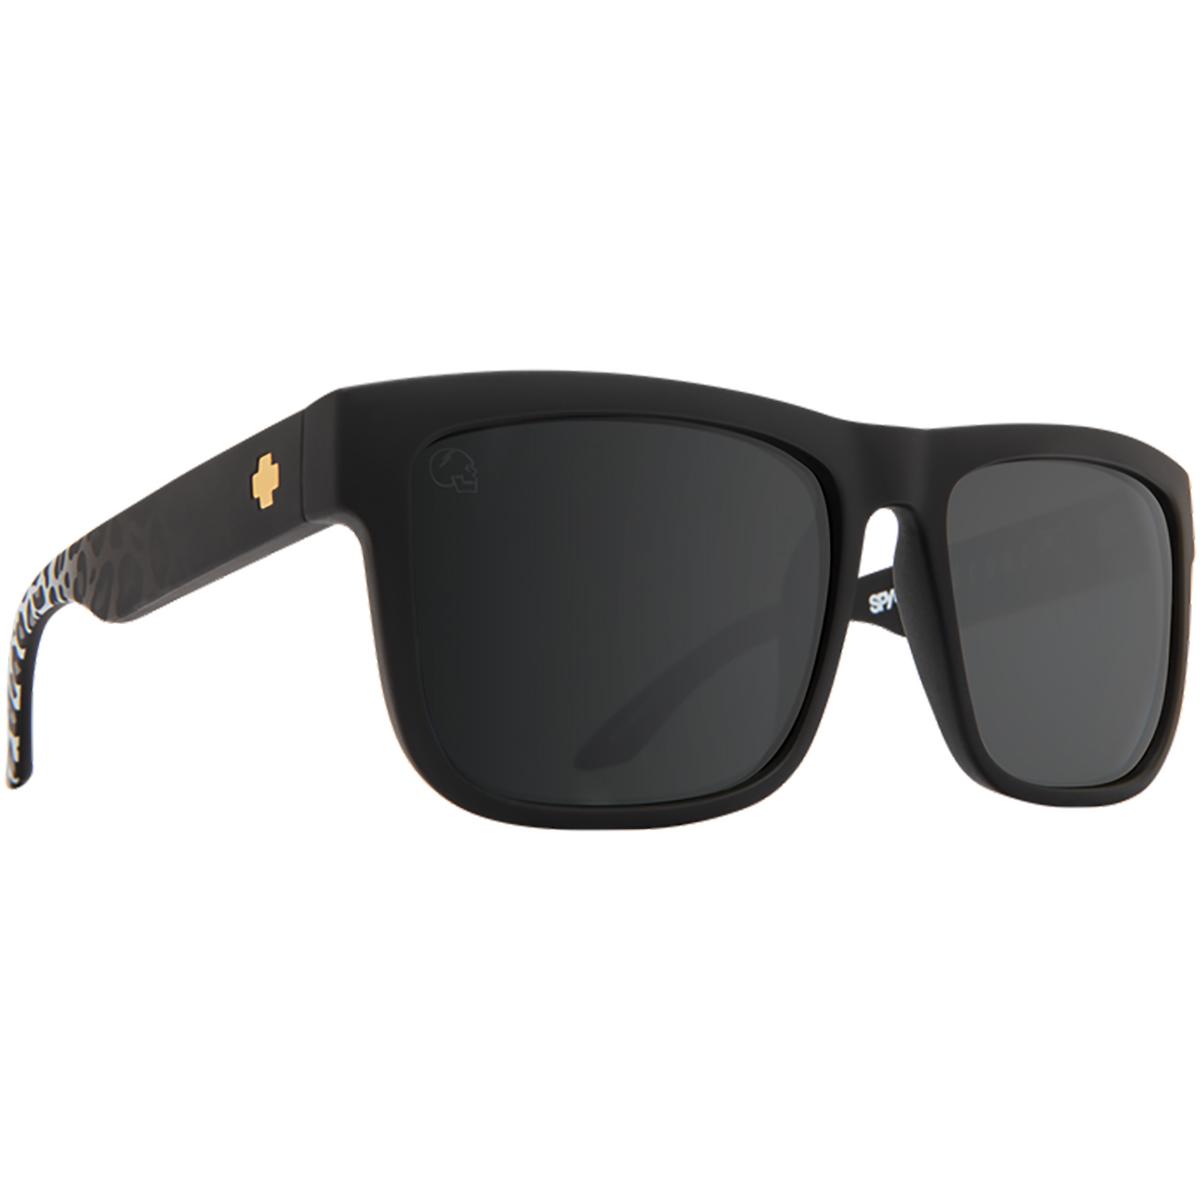 SUNGLASSES サングラス DISCORD ディスコード SLAYCO | MATTE BLACK LEOPARD FADE - HAPPY GRAY GREEN w/ SILVER FLASH 673119150713